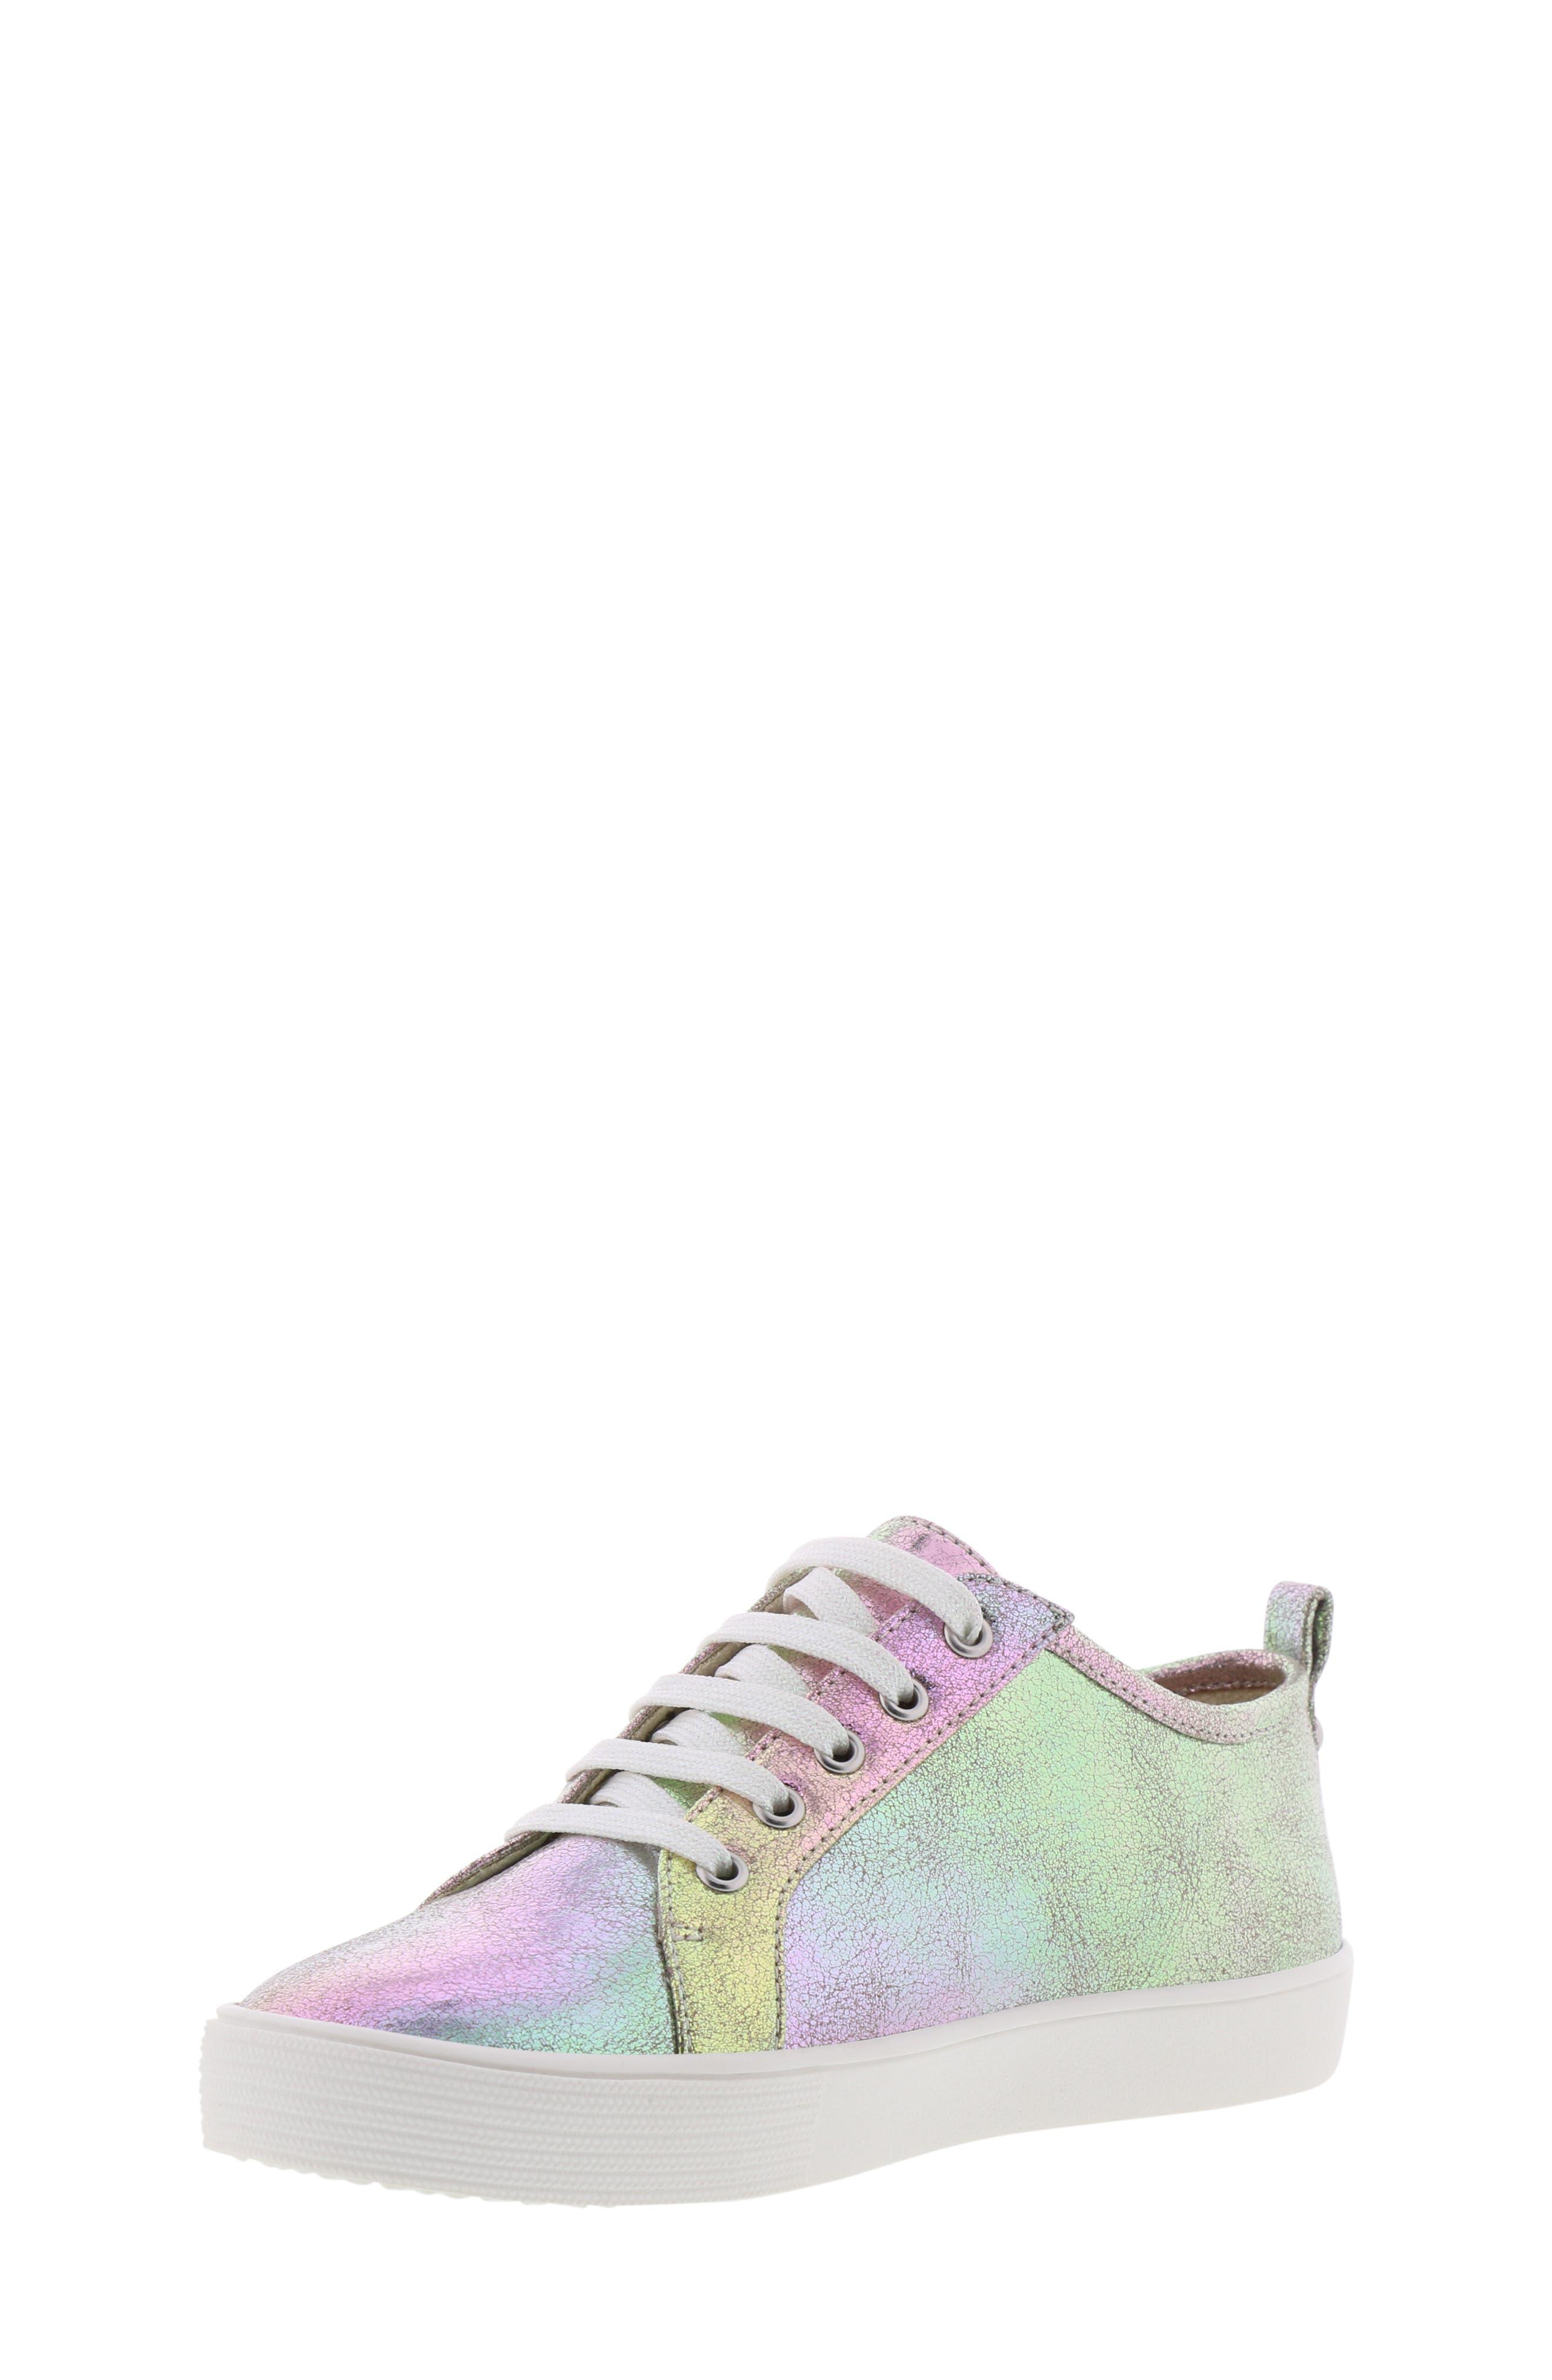 Bella Aqua Slip-On Sneaker,                             Alternate thumbnail 9, color,                             GASOLINE IRIDESCENT